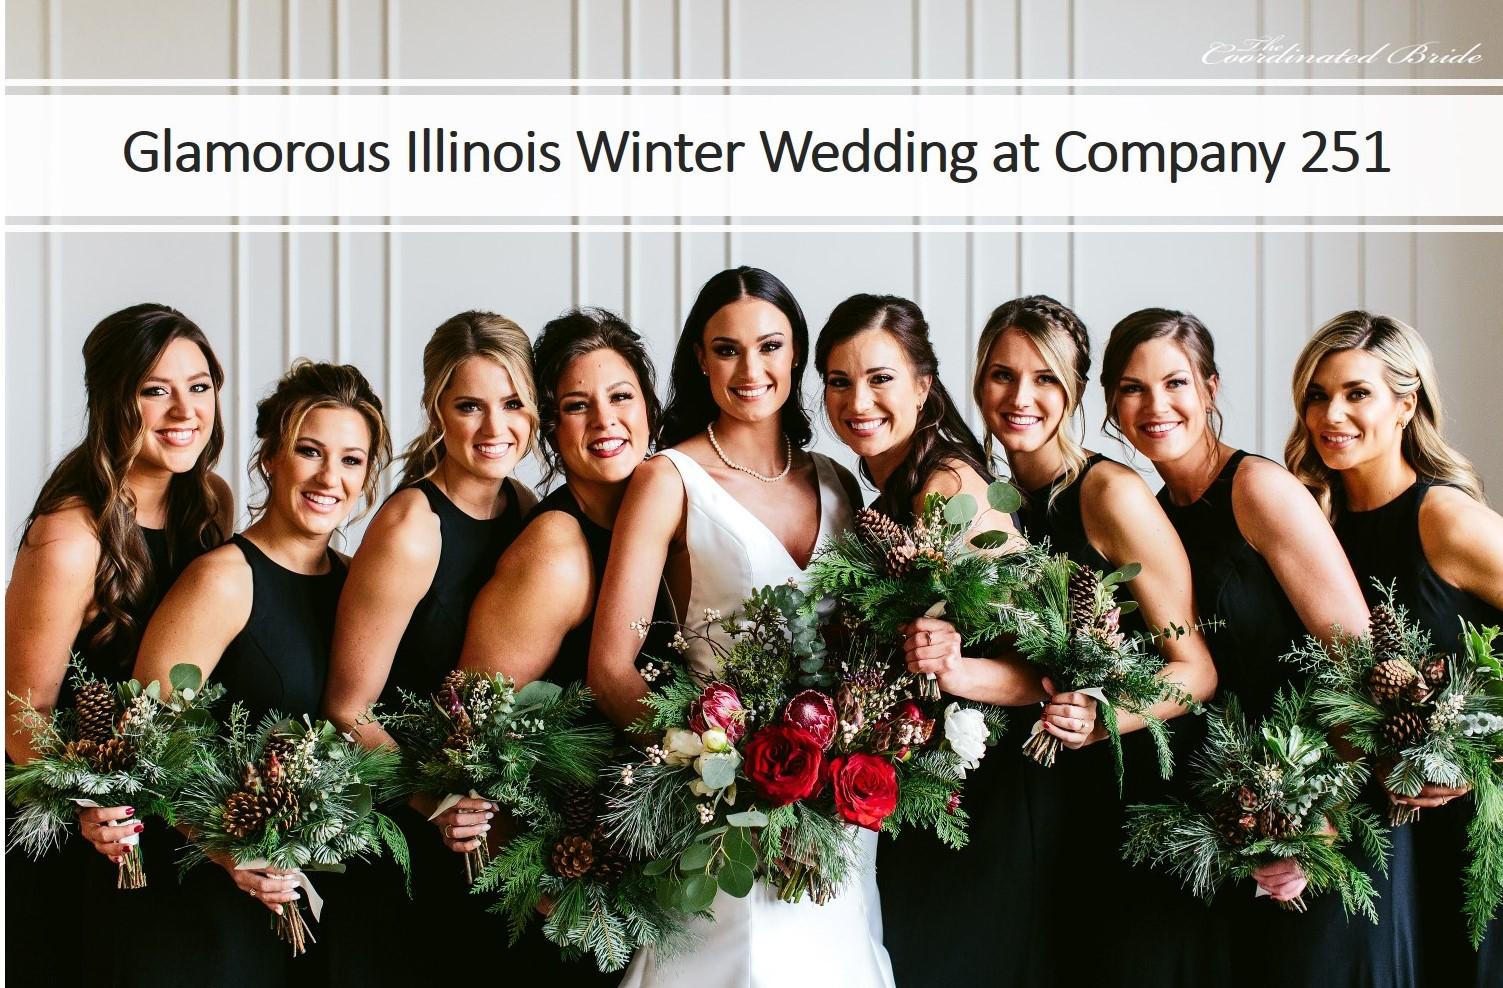 A Glamorous Illinois Winter Wedding at Company 251